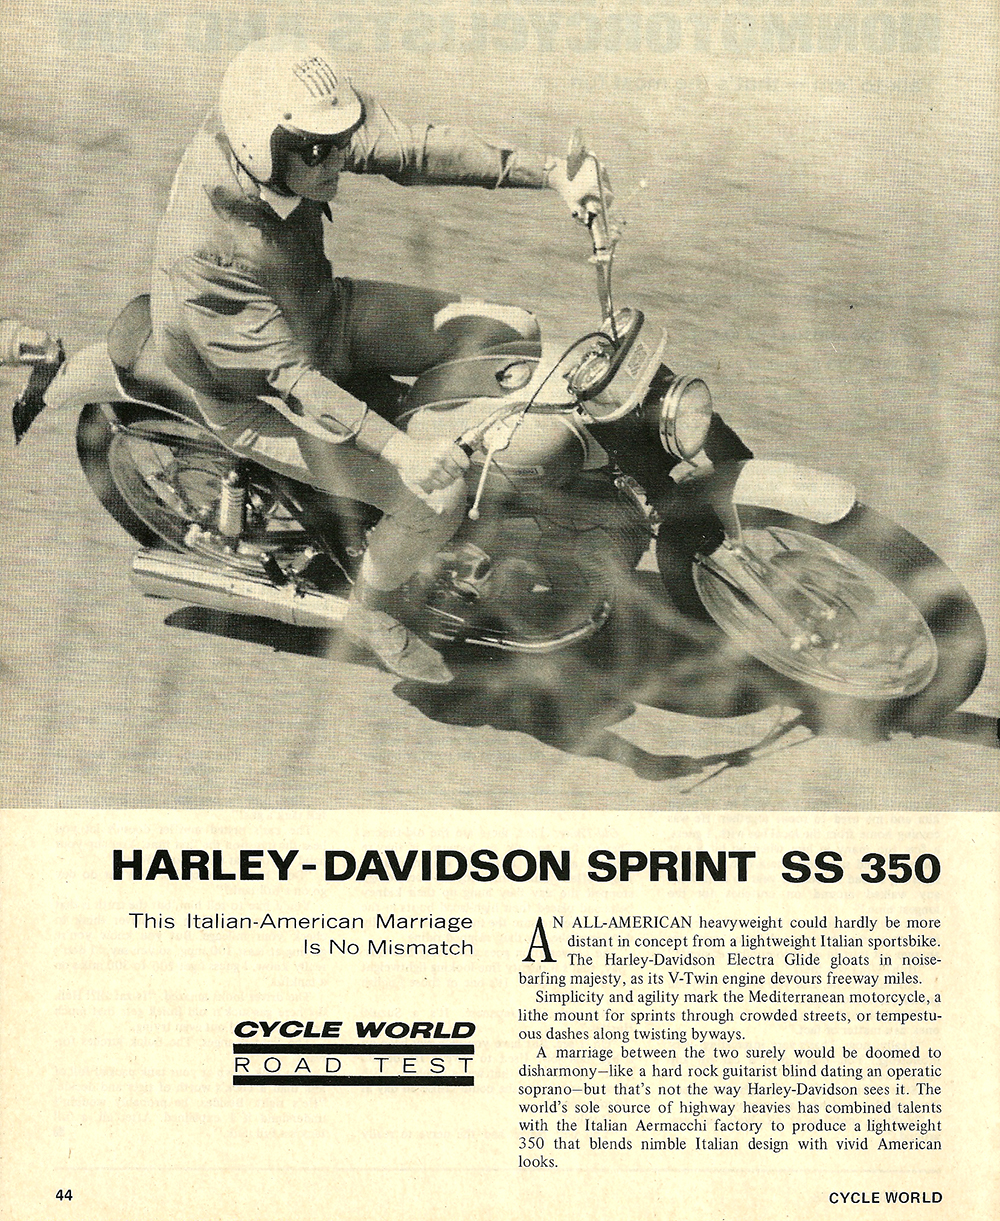 1968 Harley Sprint ss 350 road test 01.jpg